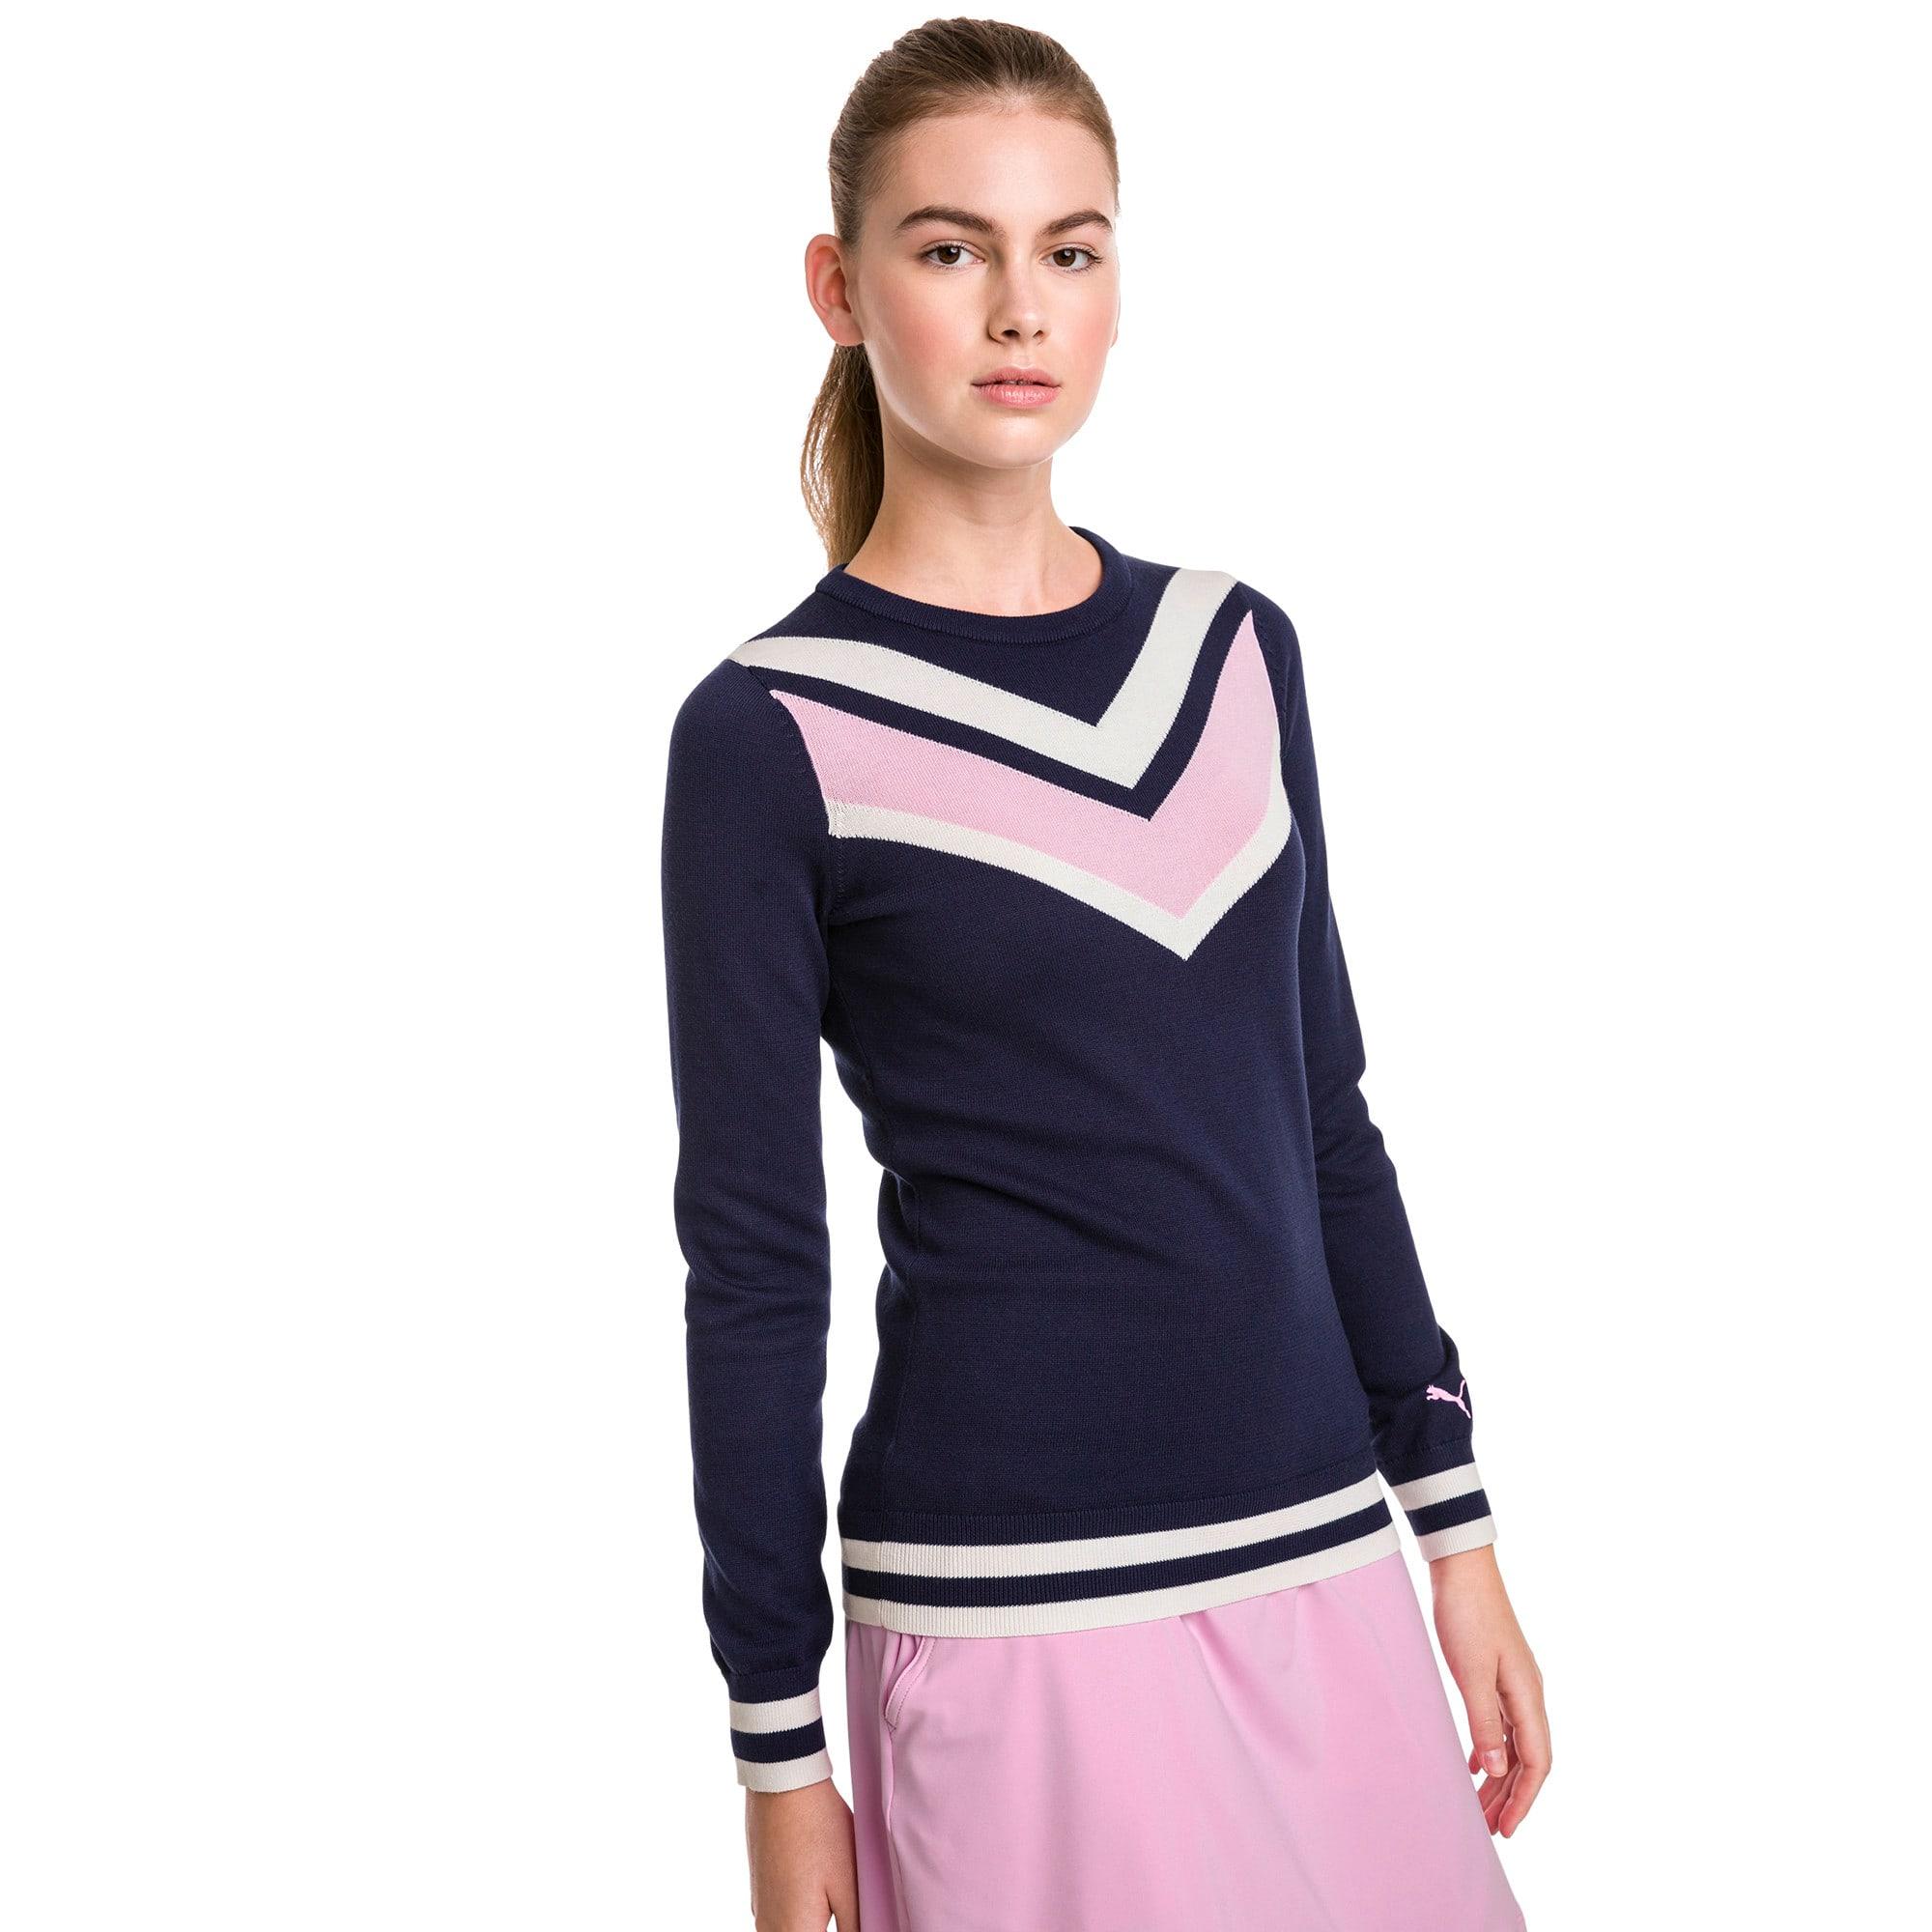 Thumbnail 1 of Chevron Women's Golf Sweater, Peacoat, medium